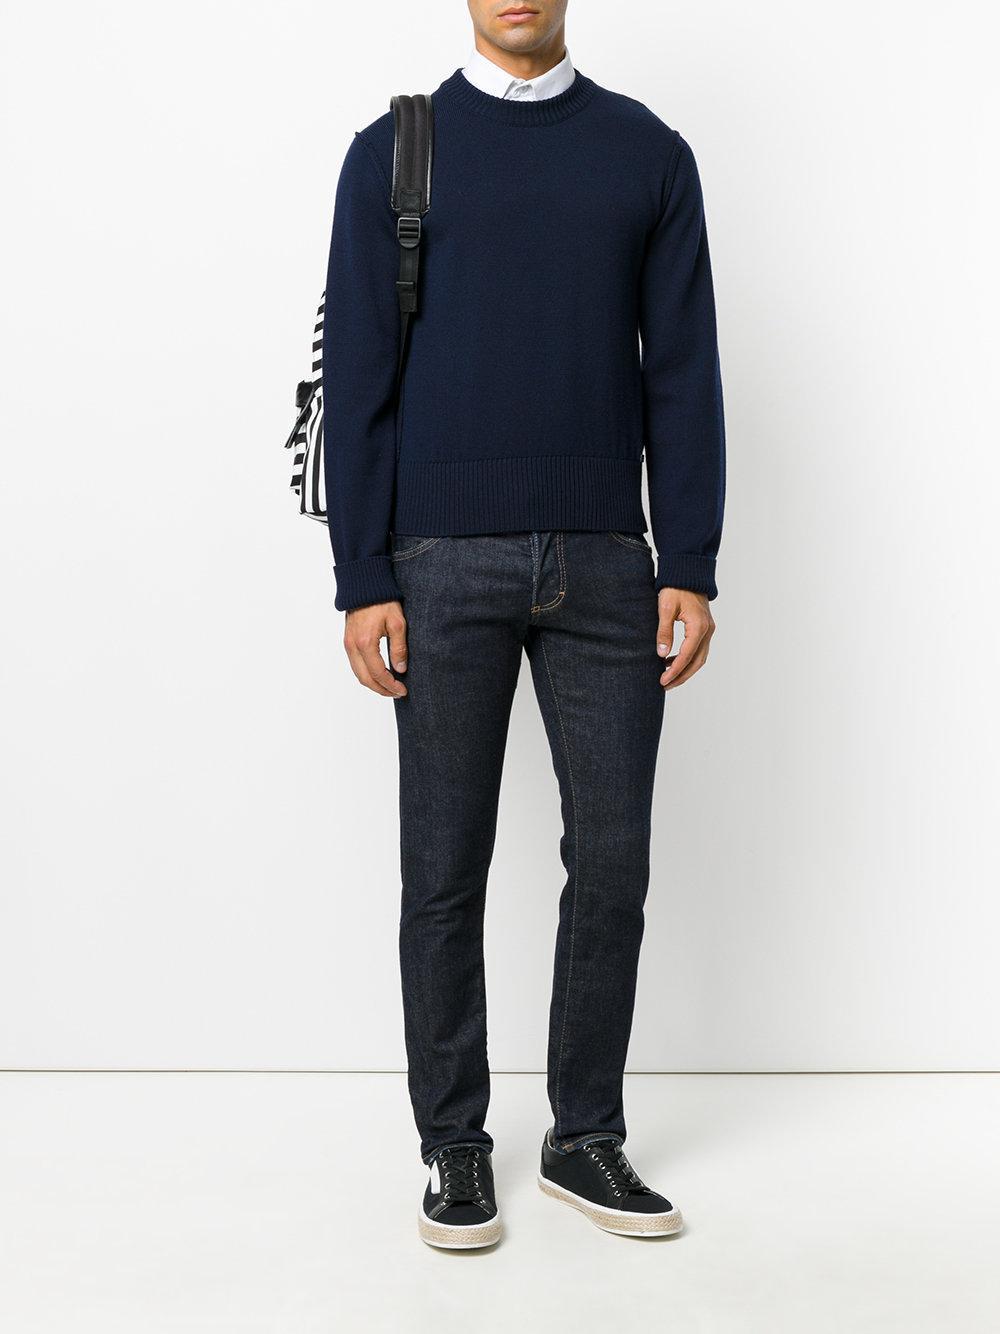 el hombro con Dolce costura Lyst Gabbana jersey en para hombres qxTwX